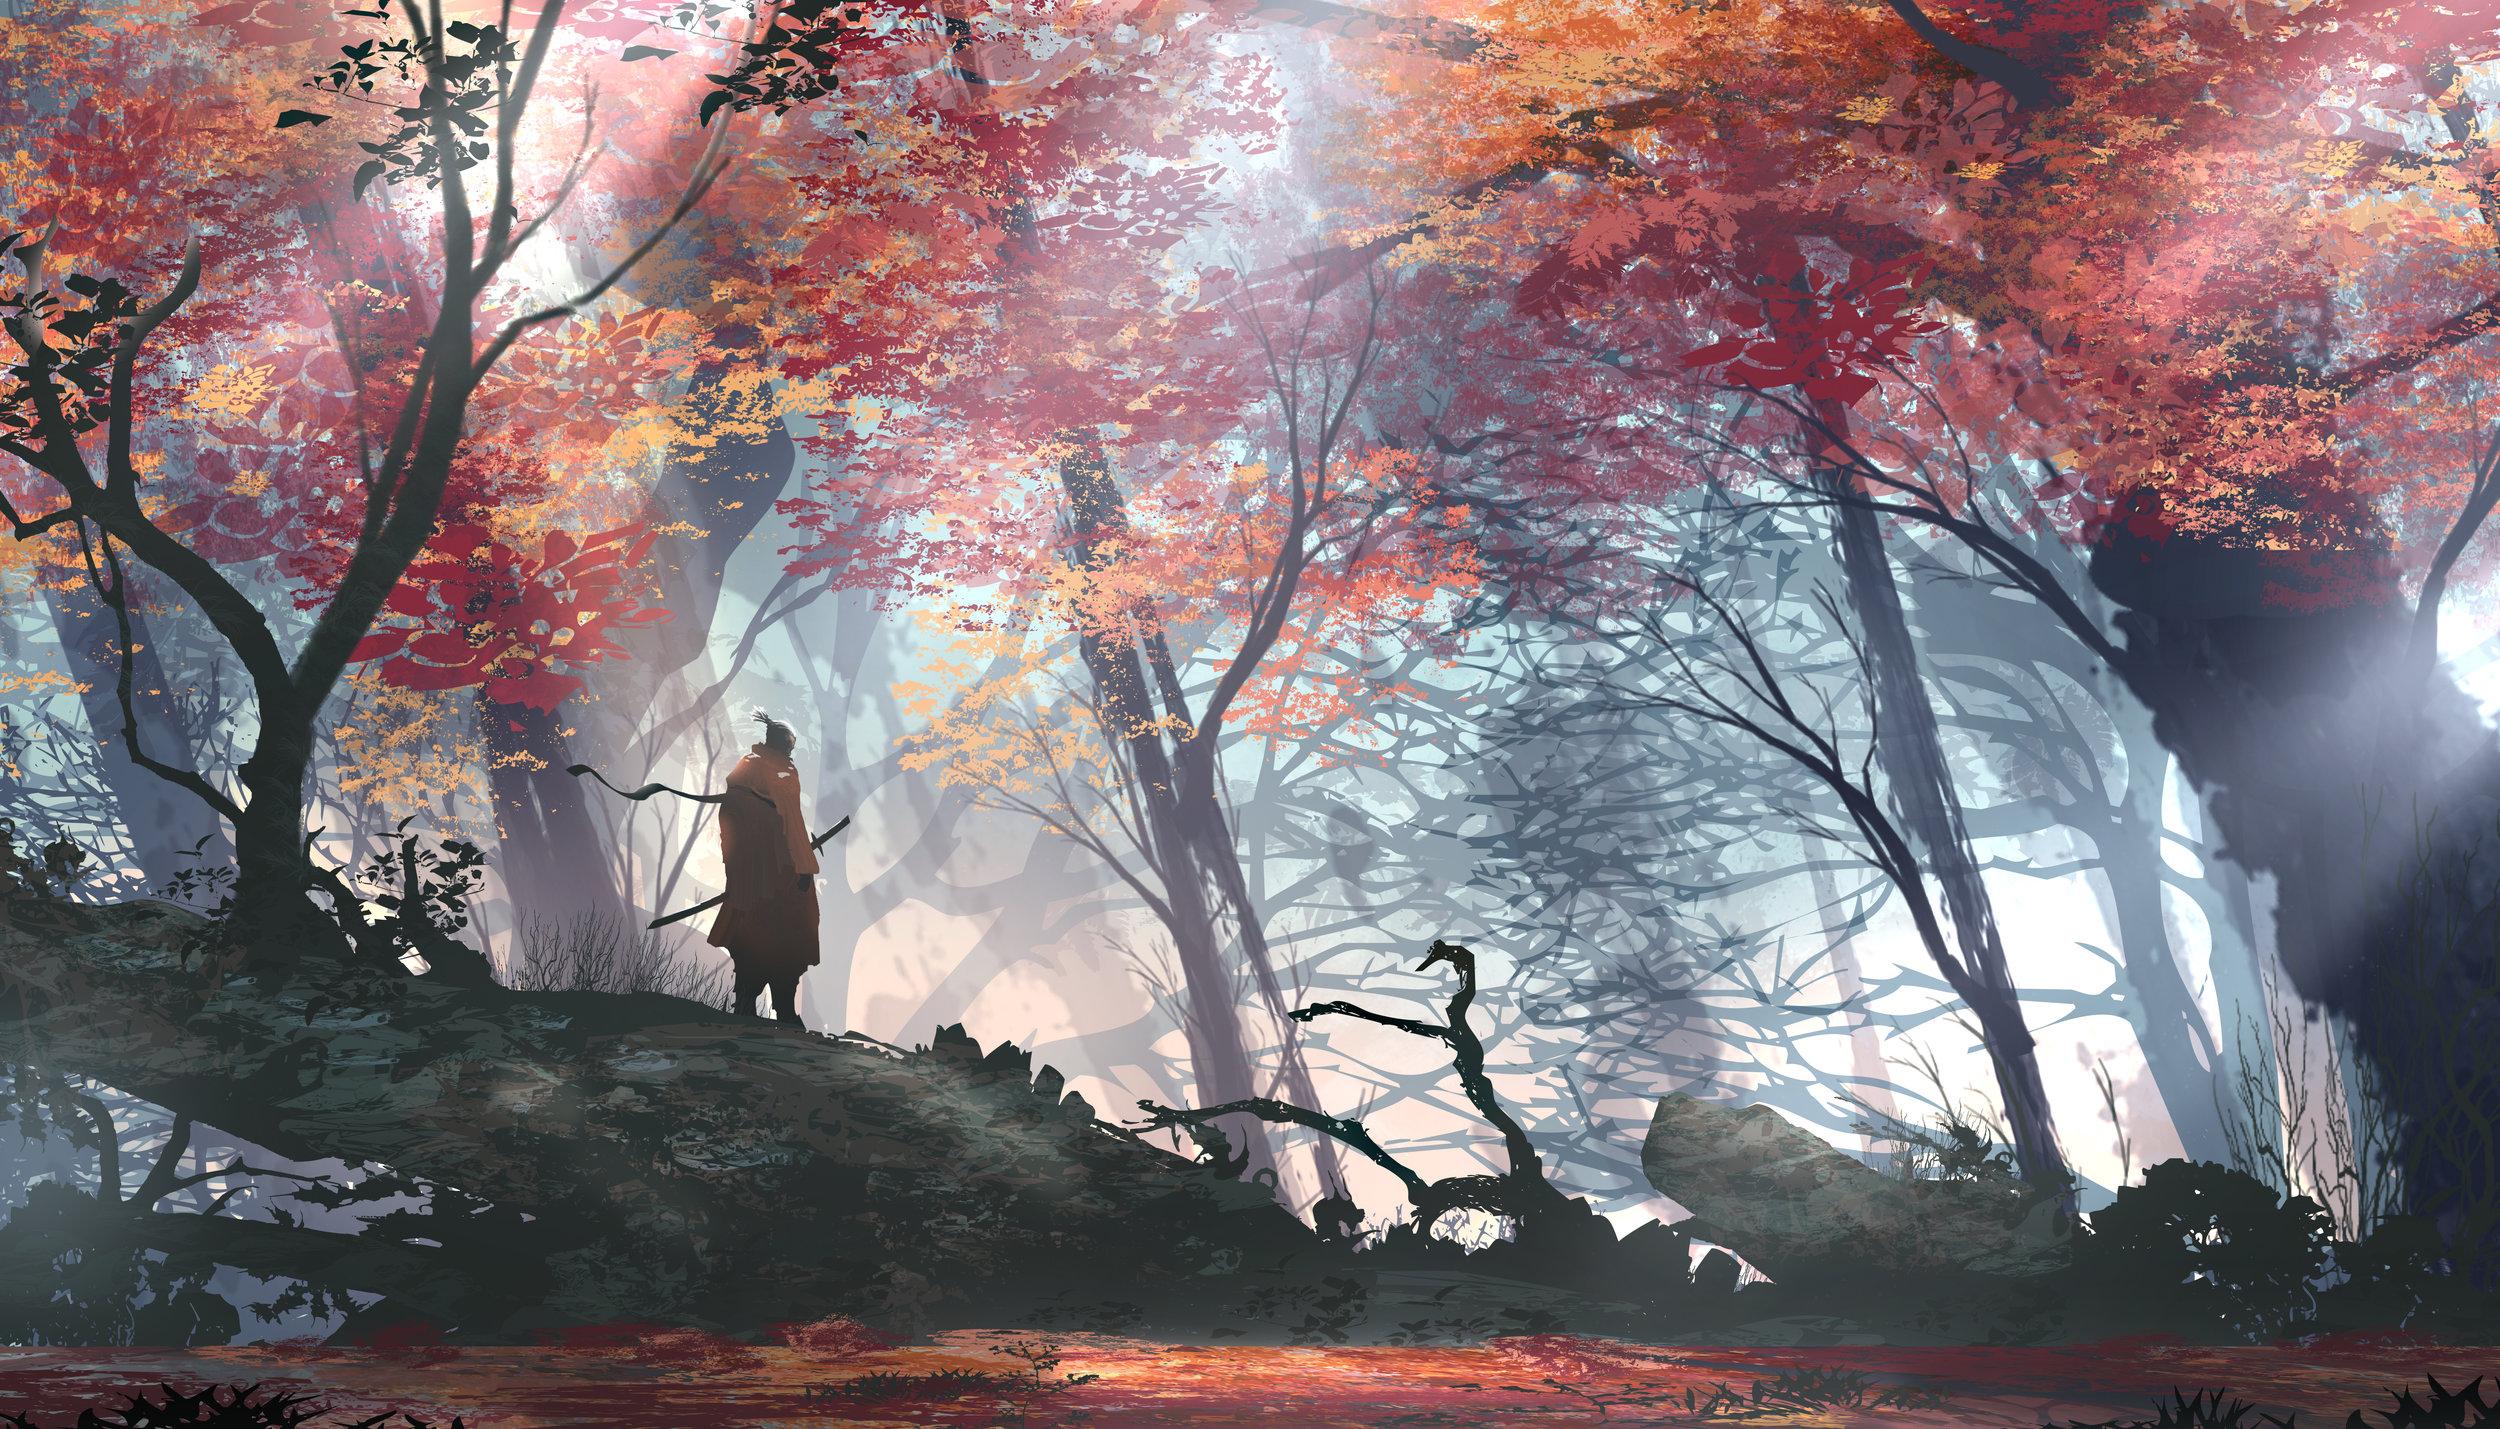 Artist:  Taco Sauce Ninja  Sourced:  http://bit.ly/2CECzGF